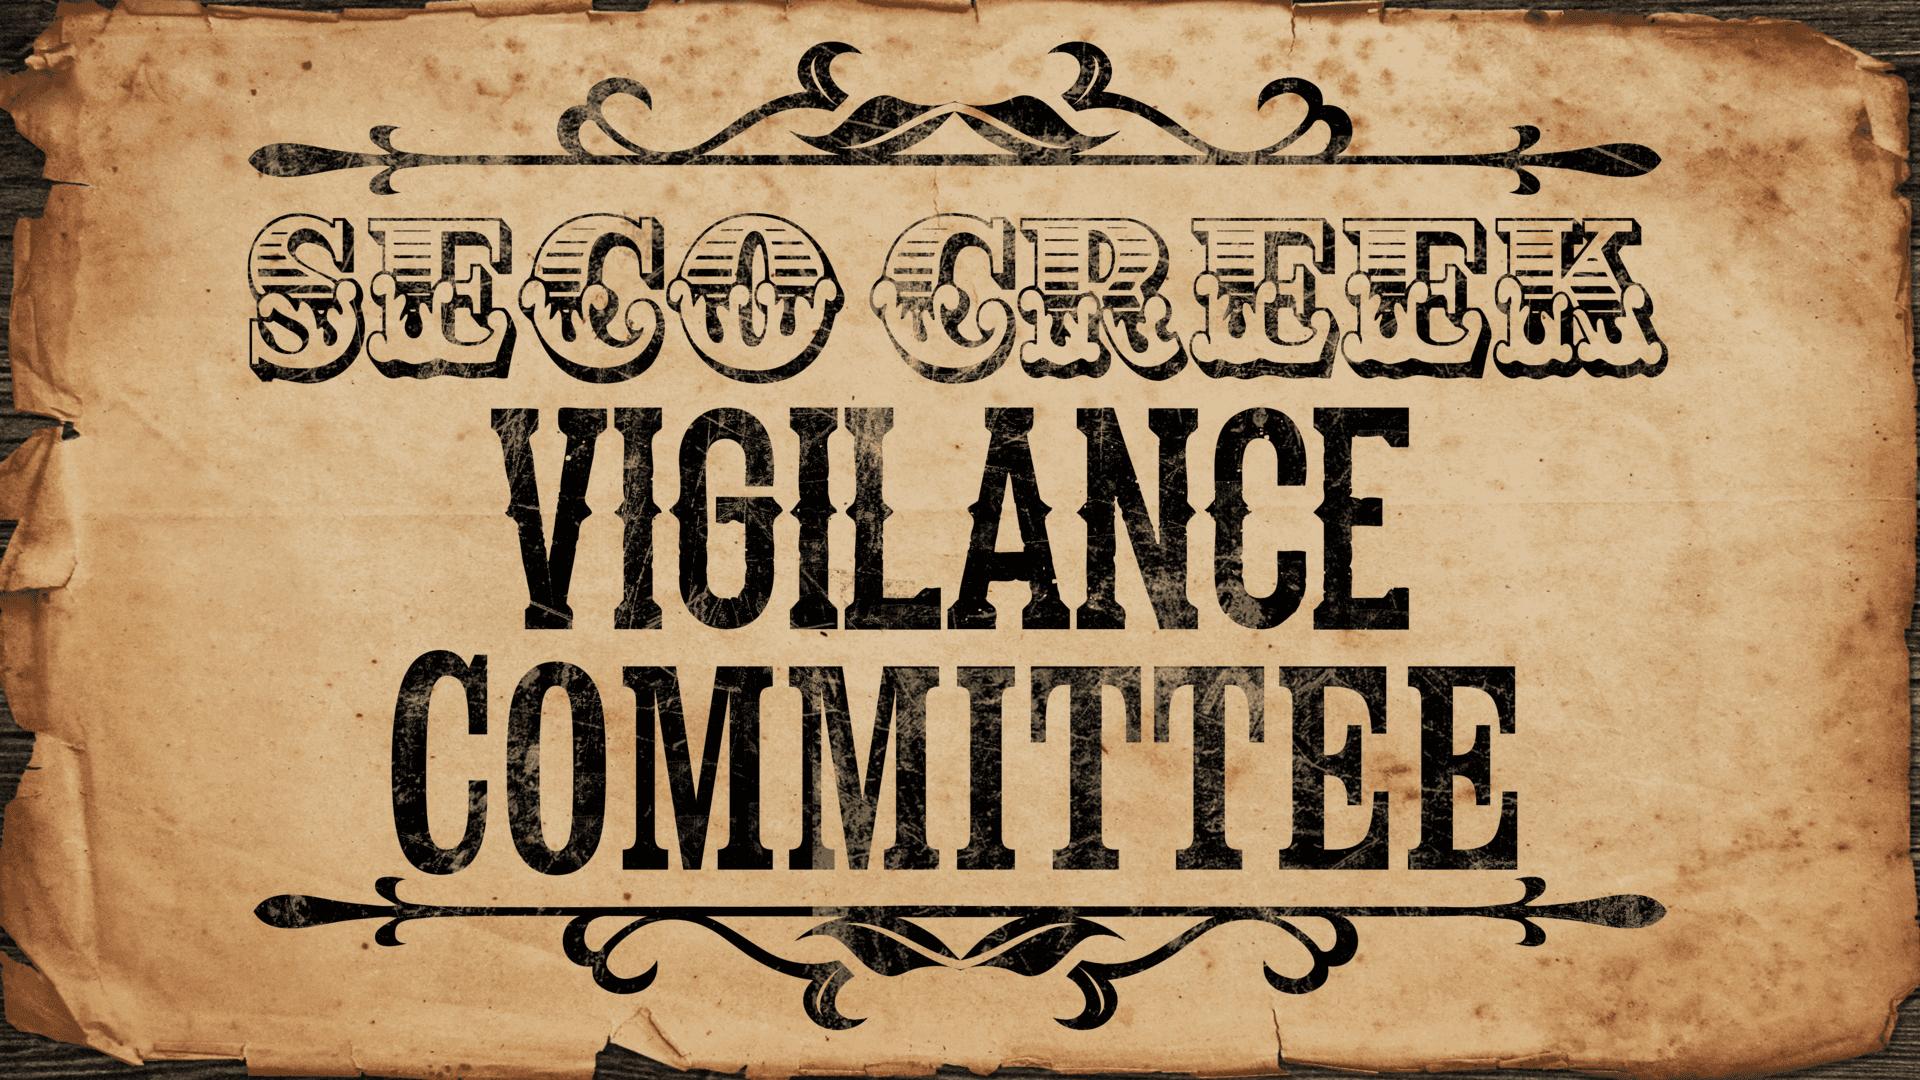 Seco Creek Vigilance Committee logo